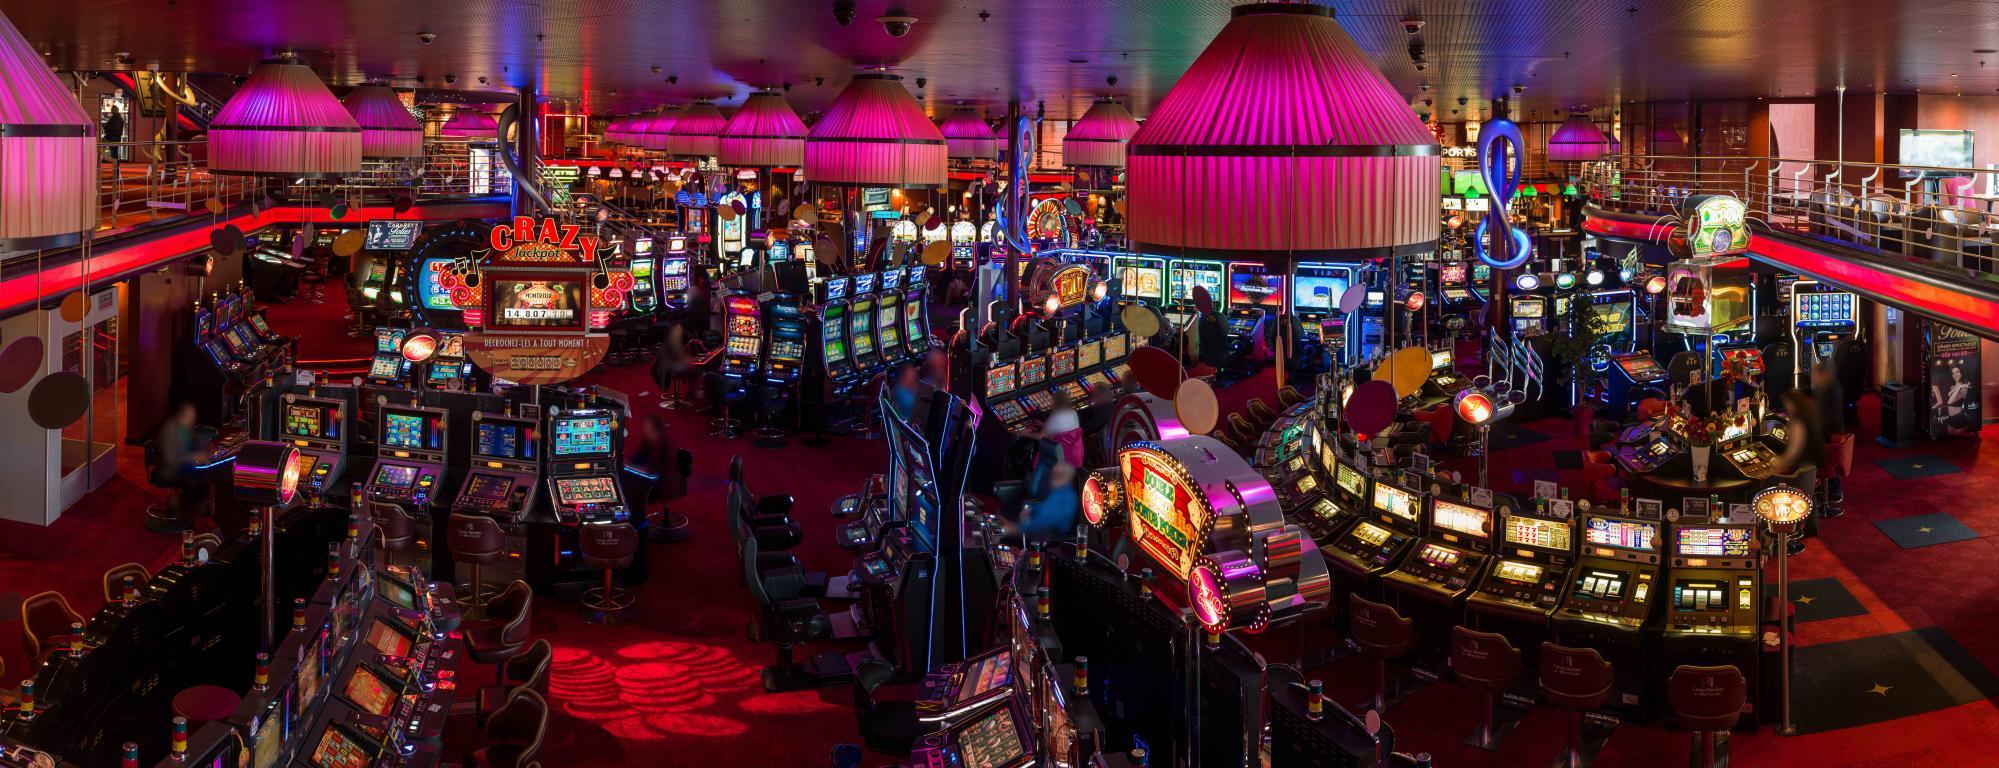 grandx gambling house online